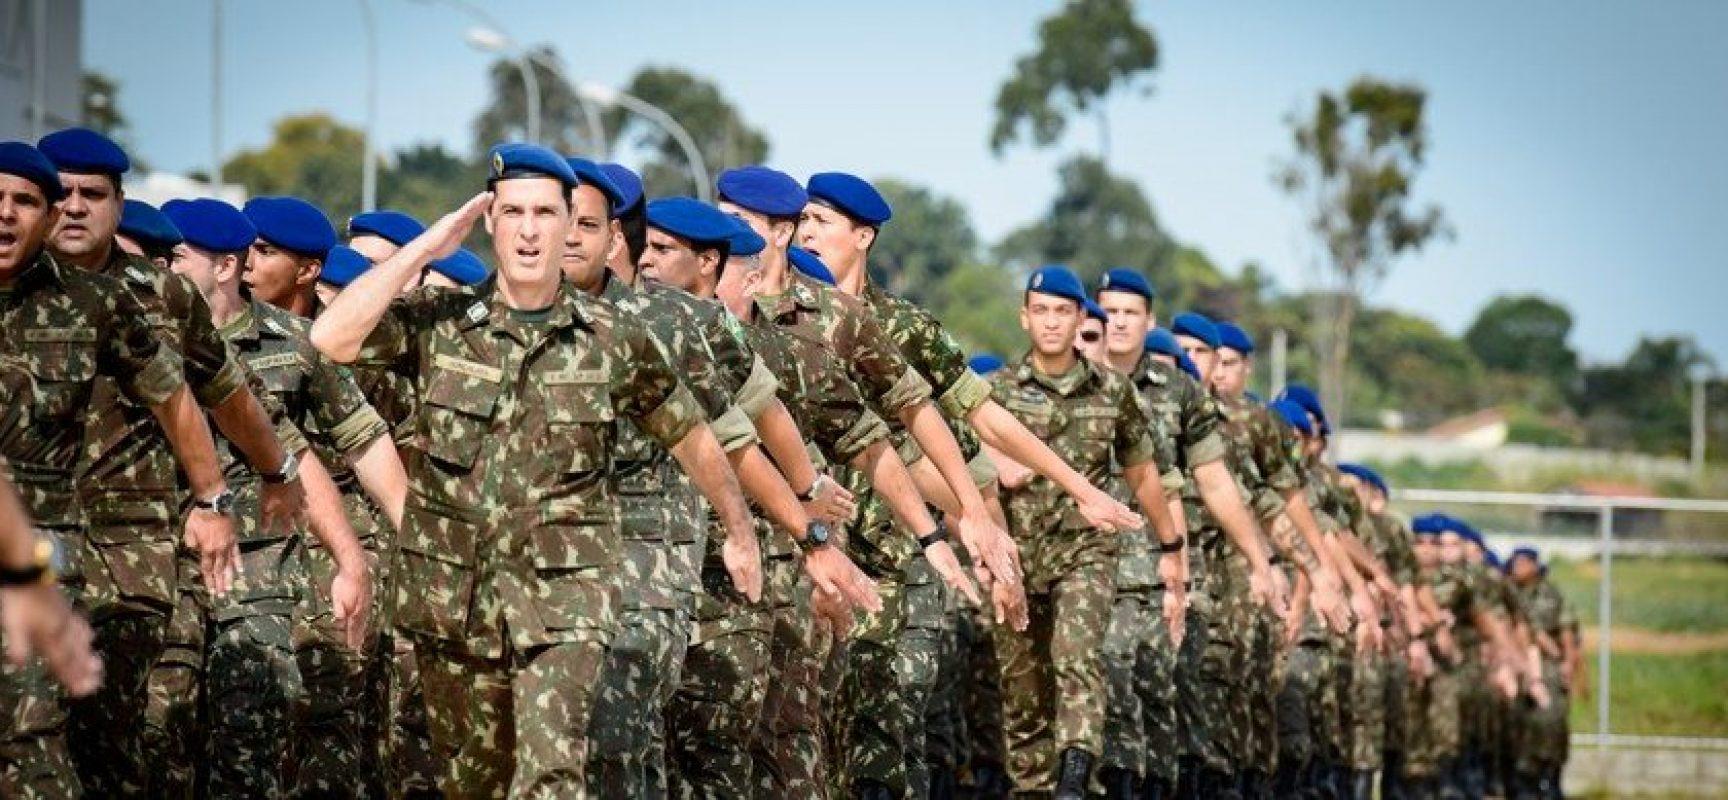 Previdência dos militares é tema de debate na terça-feira